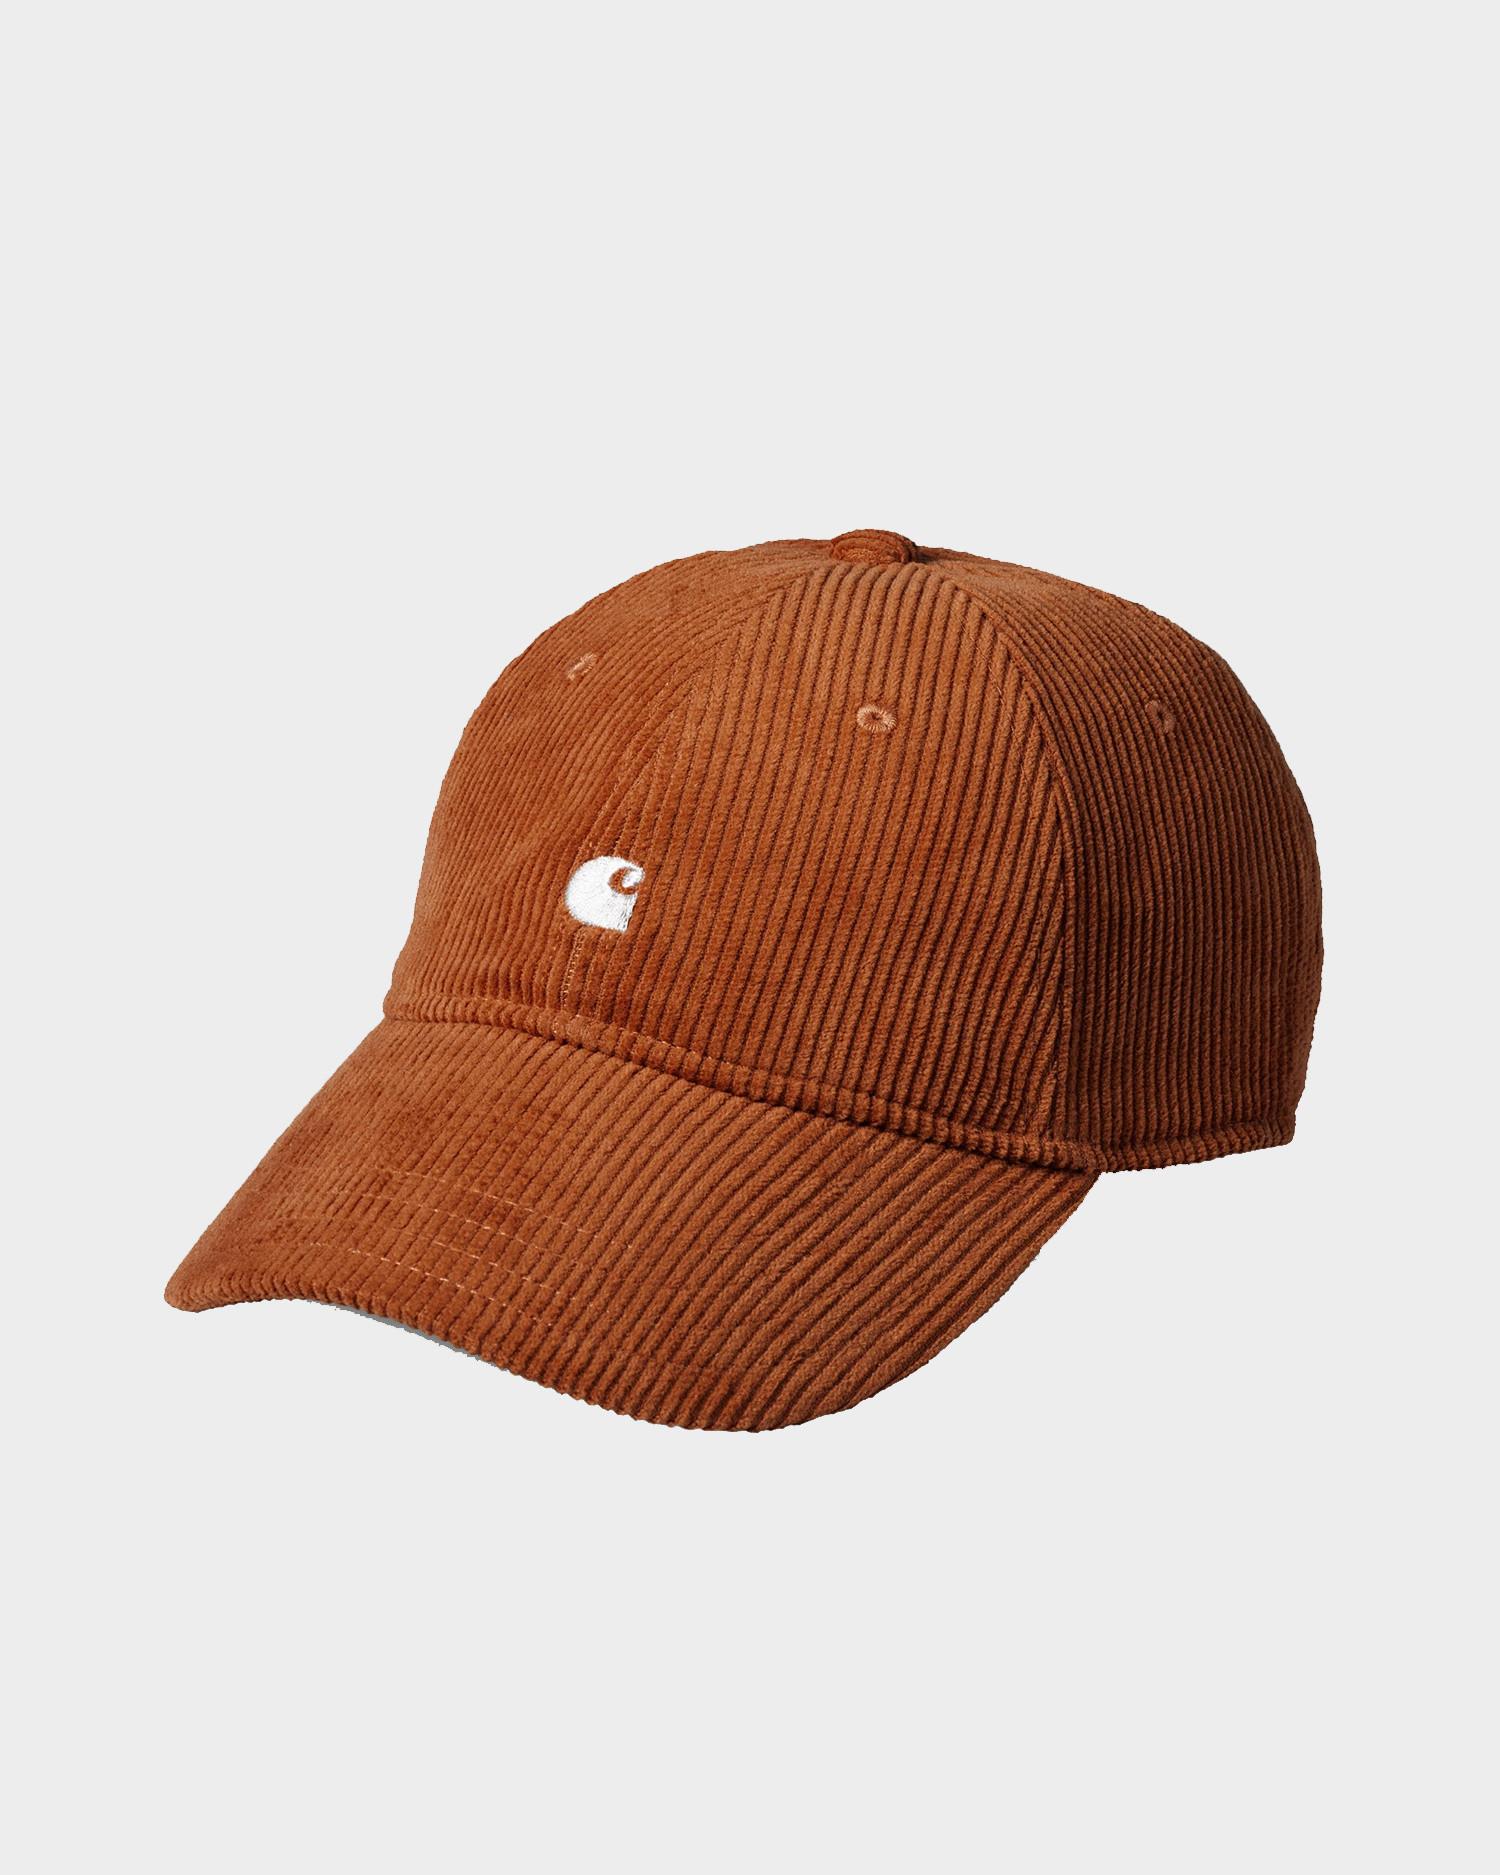 Carhartt Harlem Cap Brandy/Wax